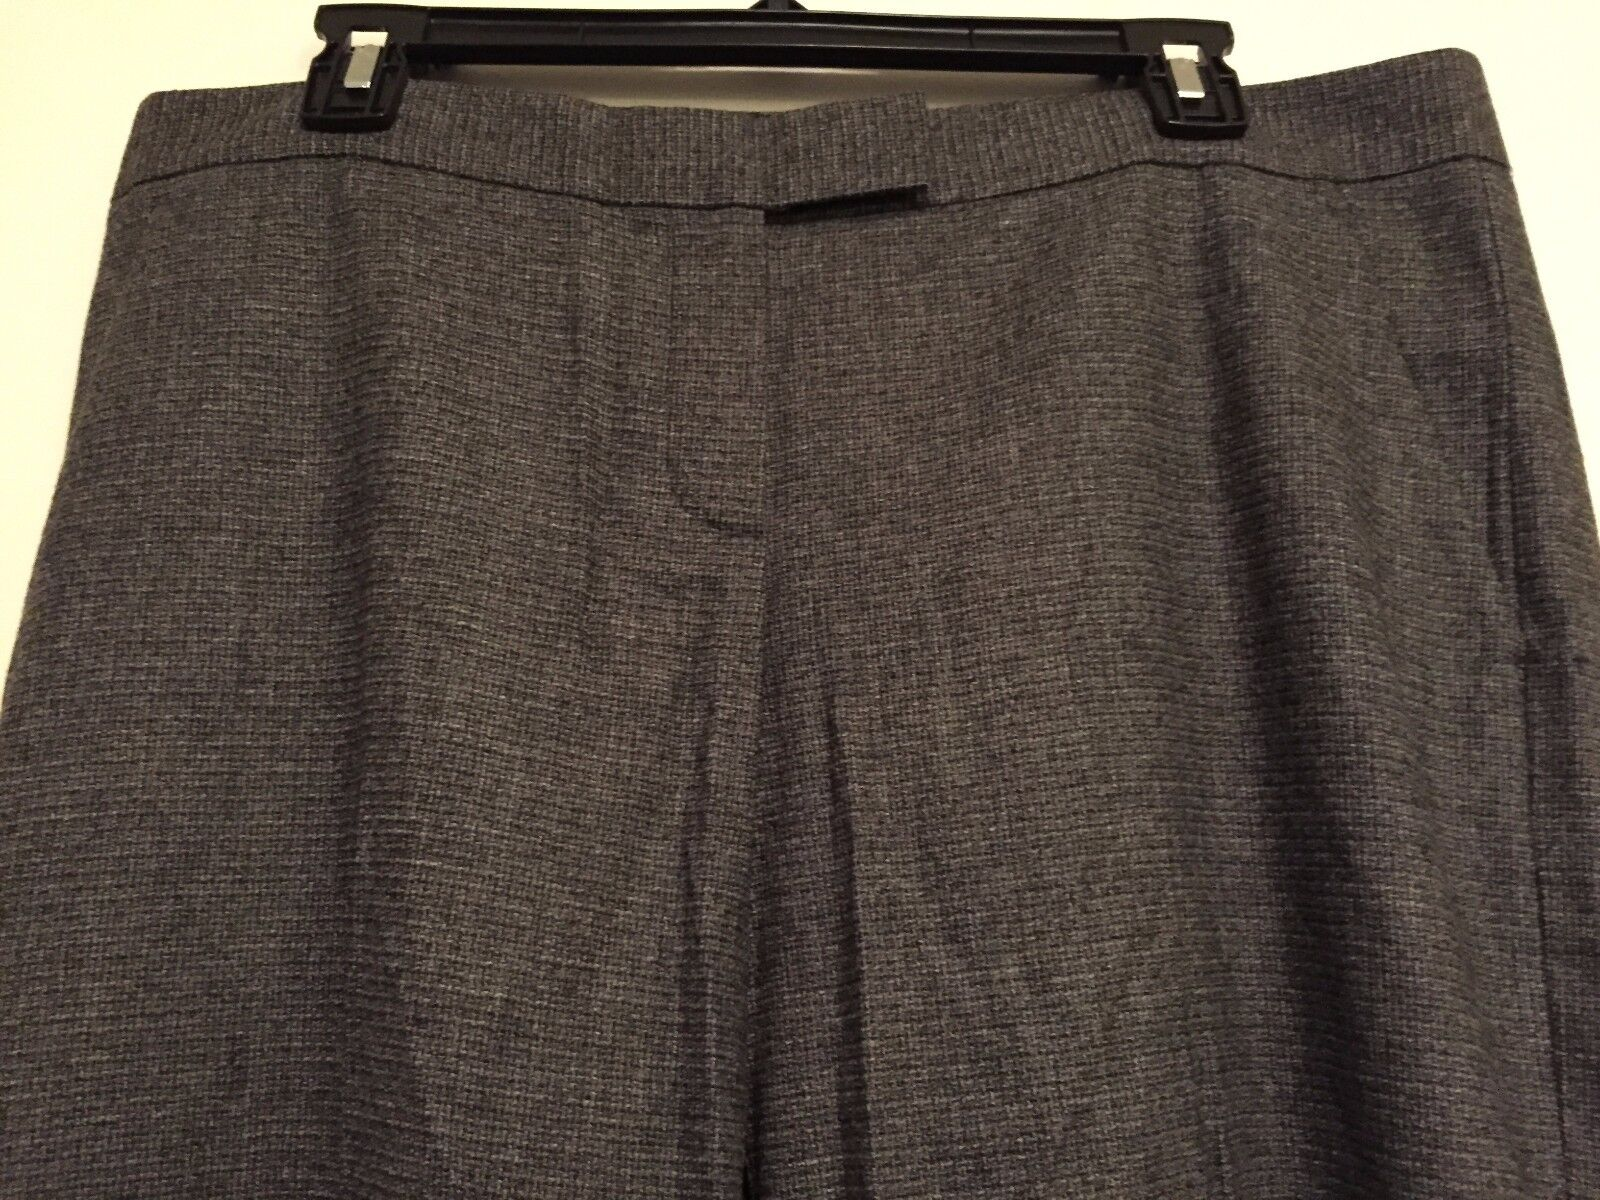 NWT Theory Nadra Dark Charcoal Stretch Wool Pants Trousers  265 – 12